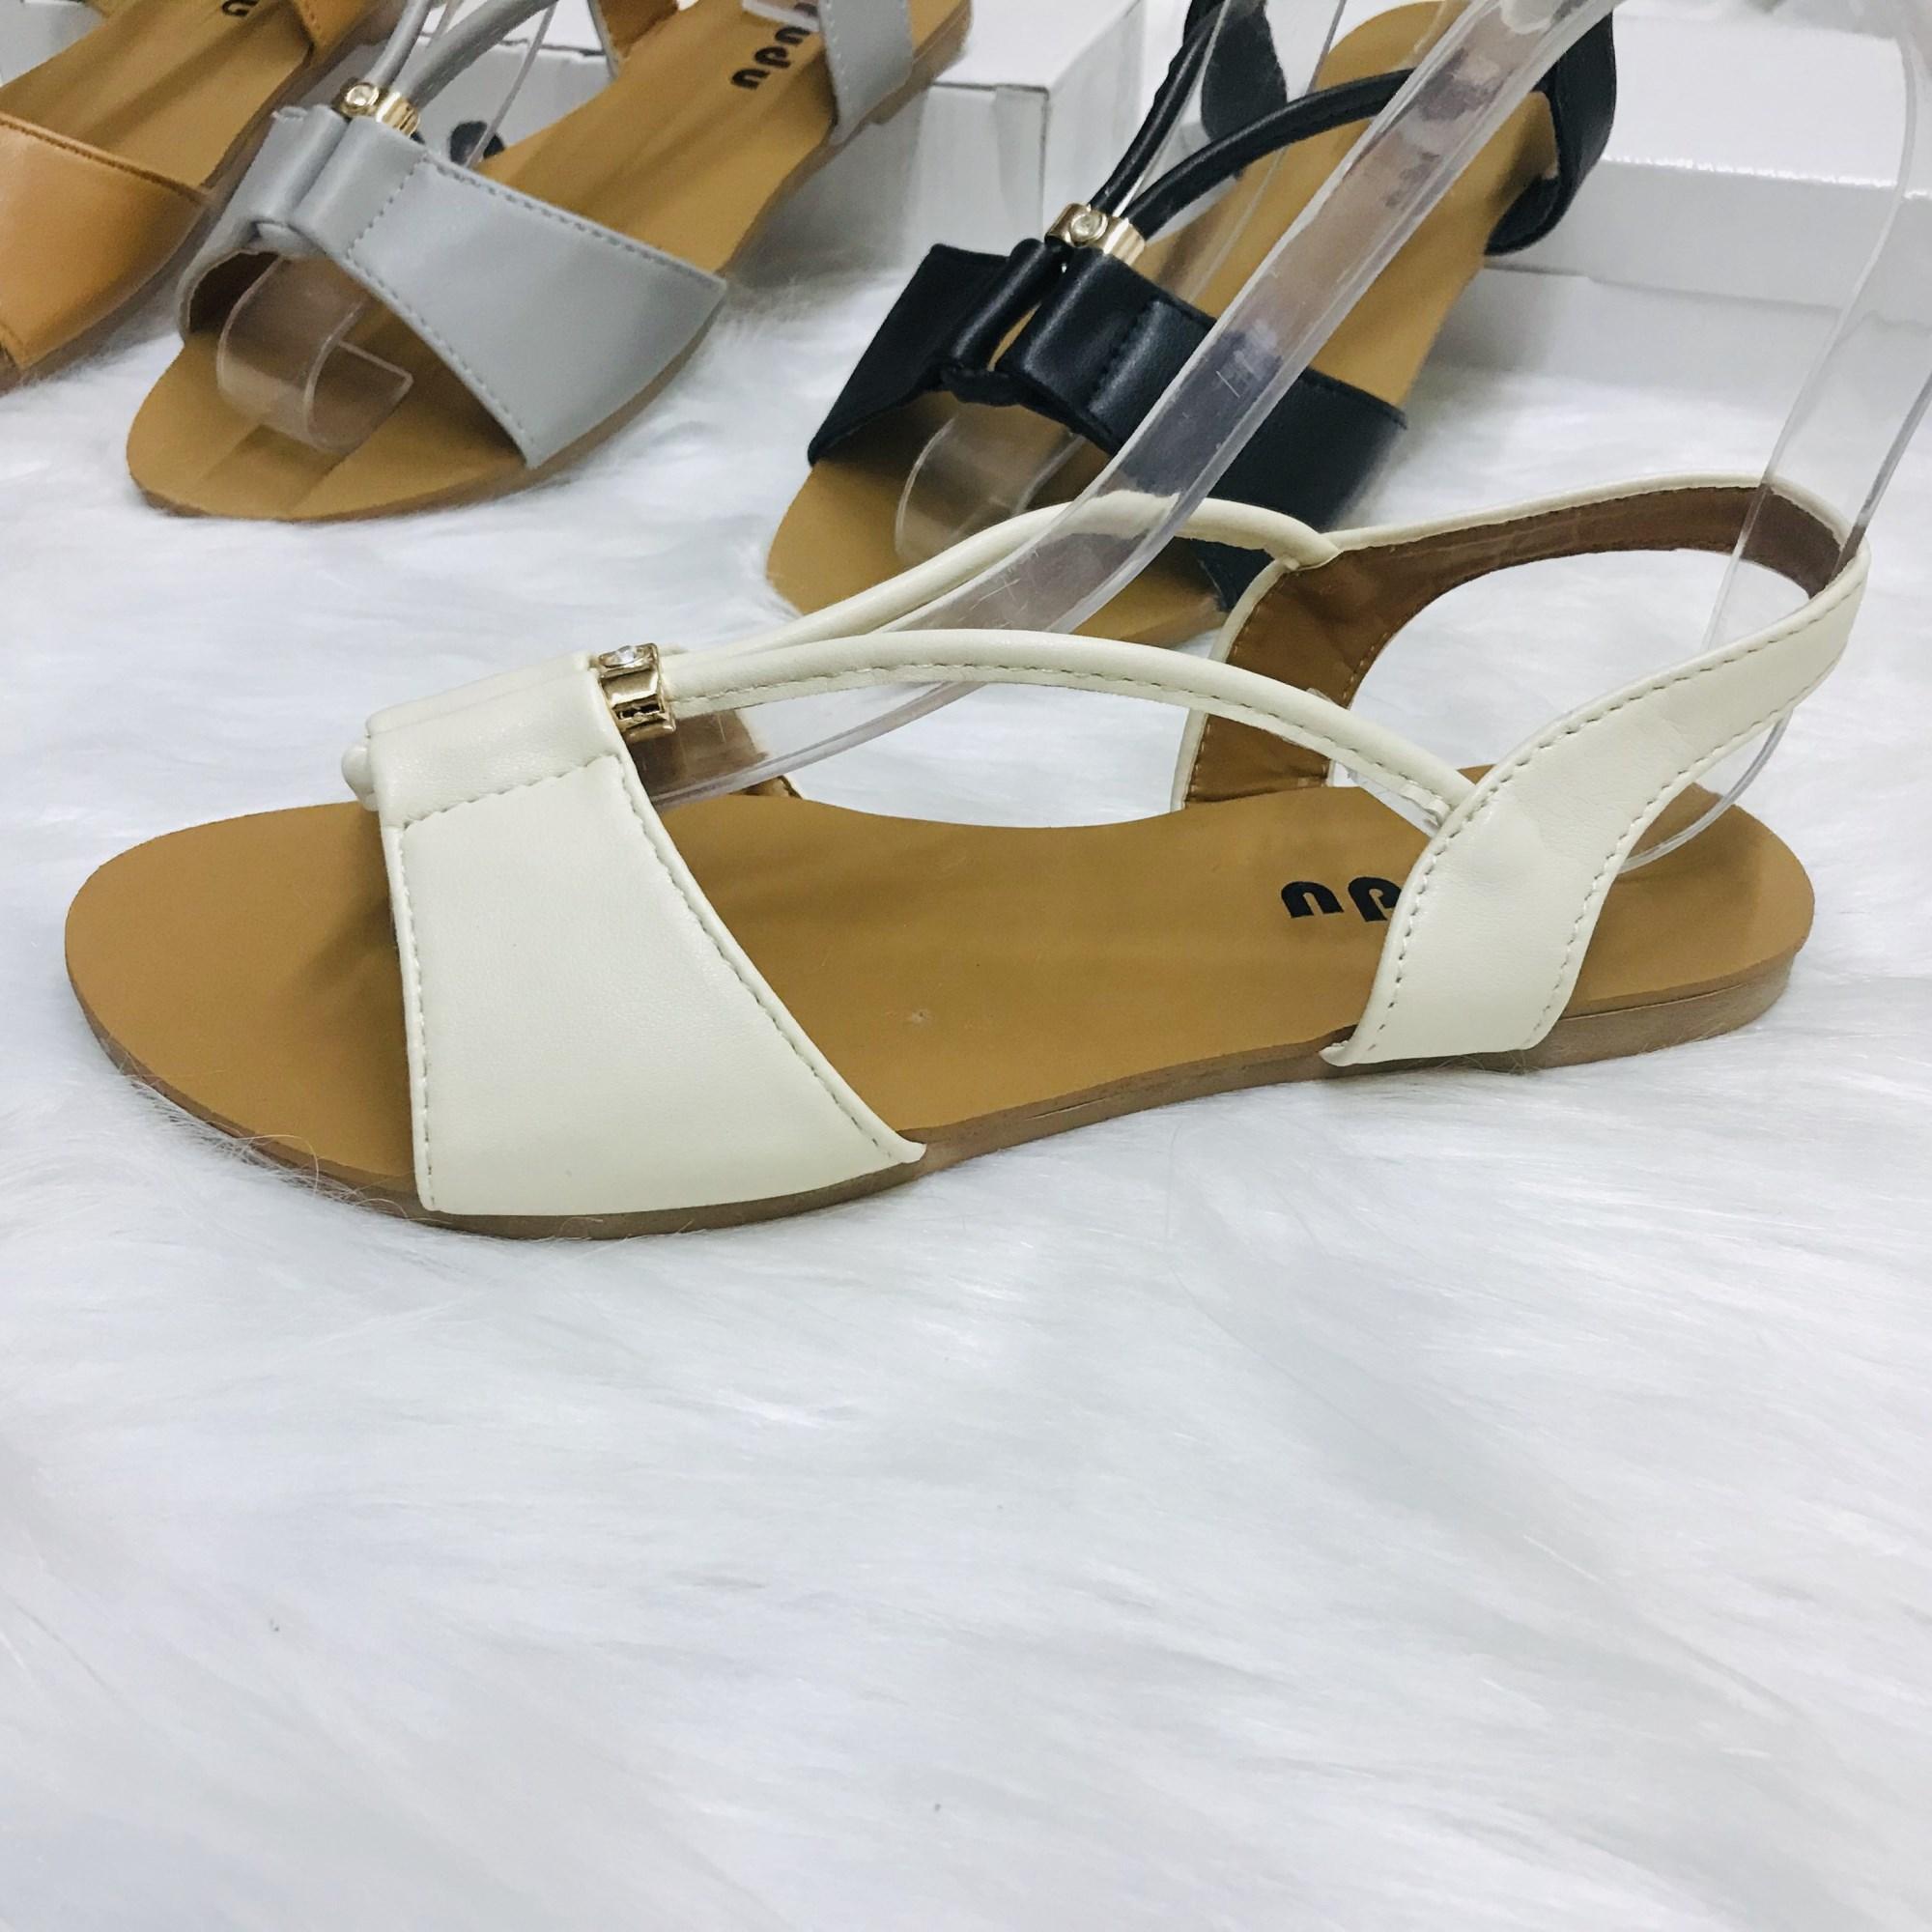 3a5b4e4e3b315b Womens Sandals for sale - Ladies Sandals online brands